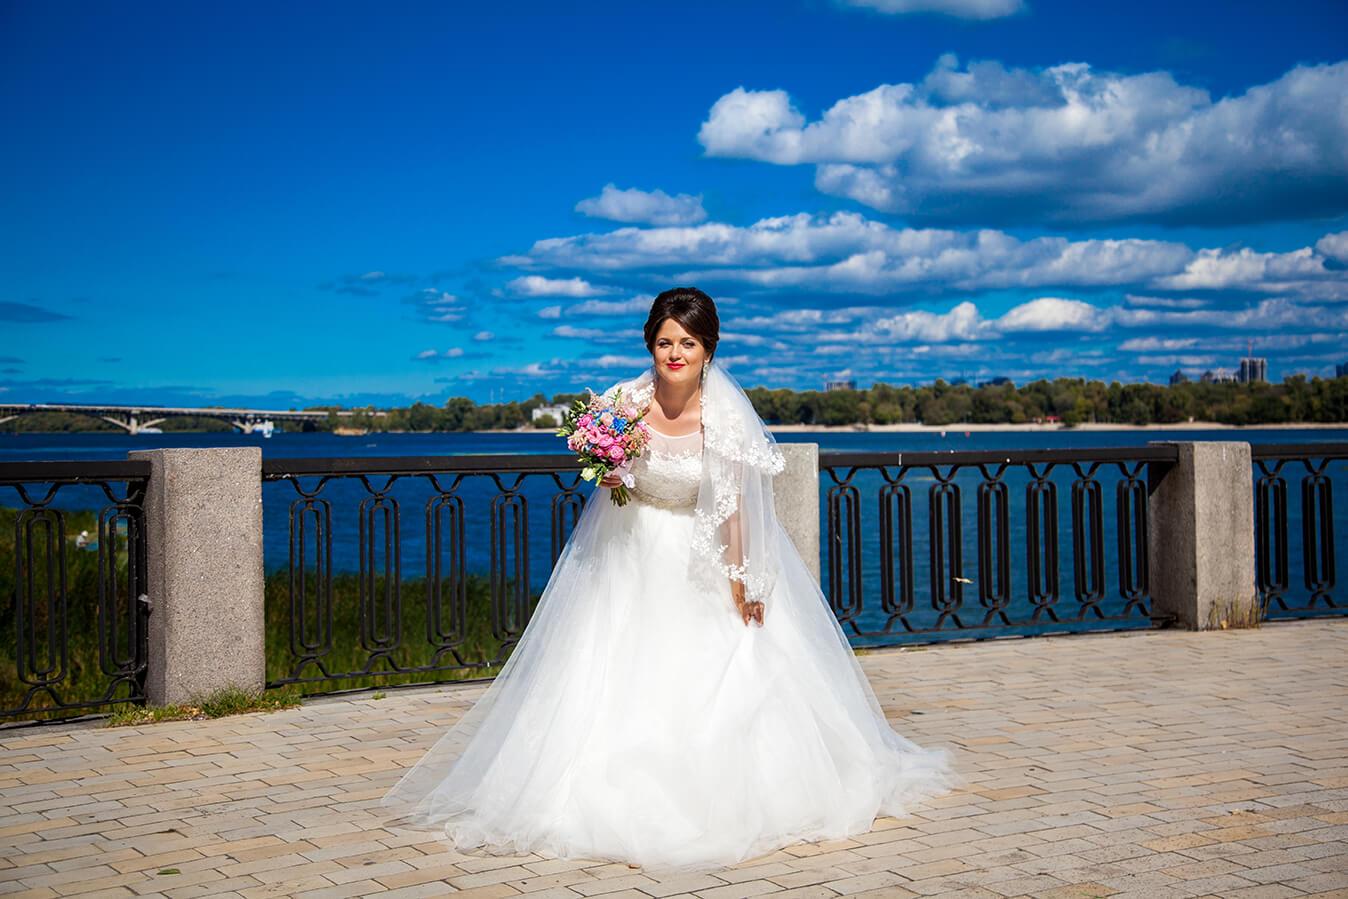 svadebnyj-fotograf-videooperator-kiev-svadebnaja-progulka-mesta-dlja-svadebnoj-fotosessii-2